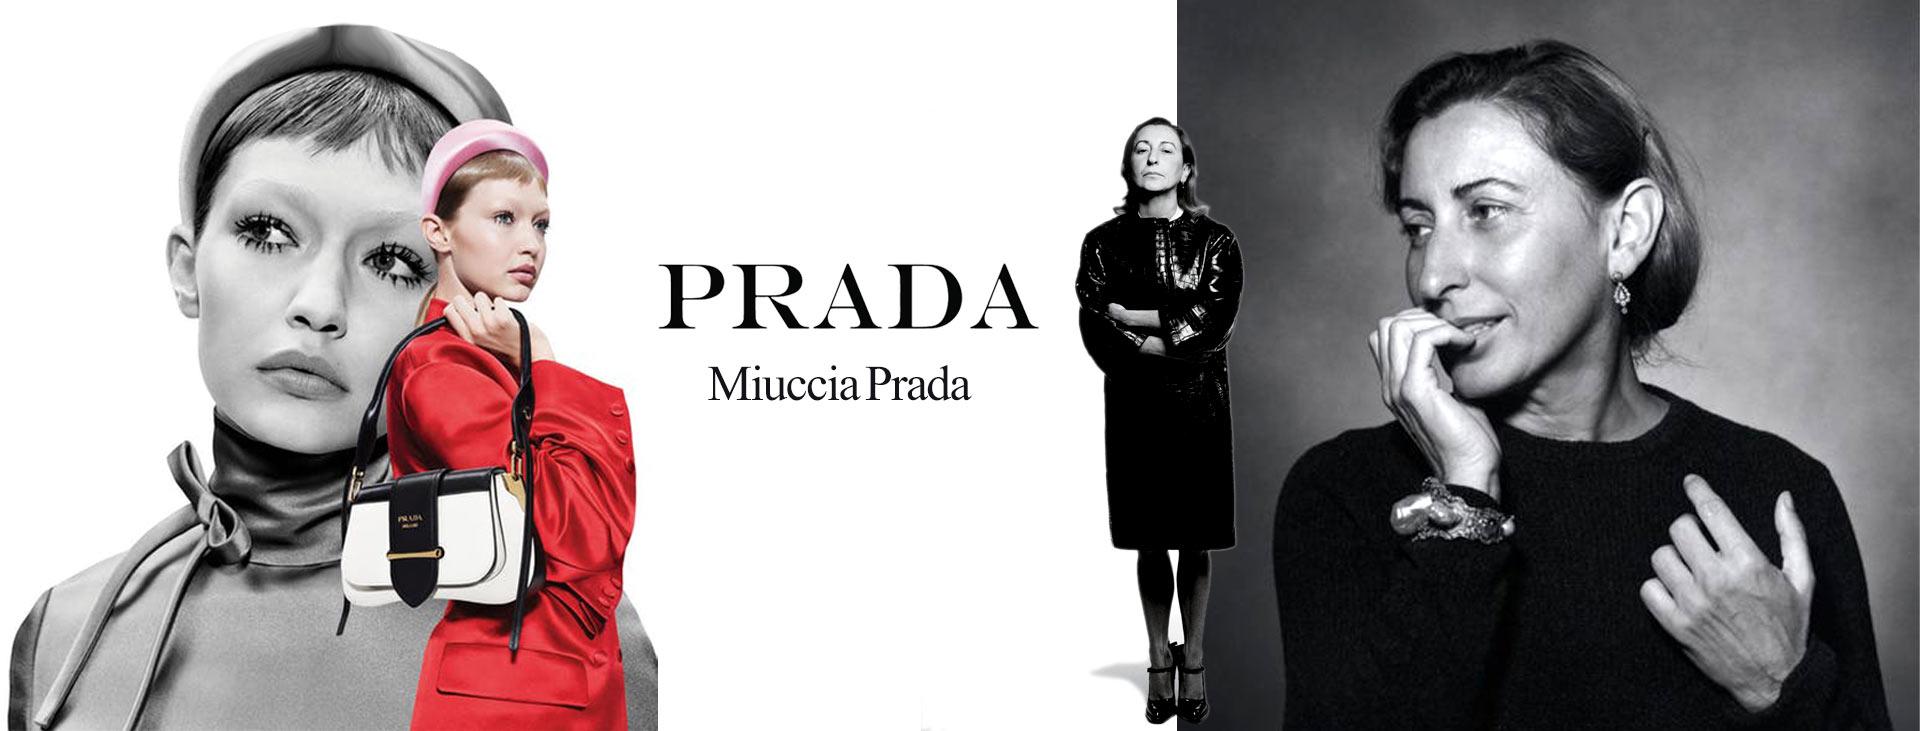 PRADA THUMB 2 1x 1 - زنان پیشگام در صنعت مد